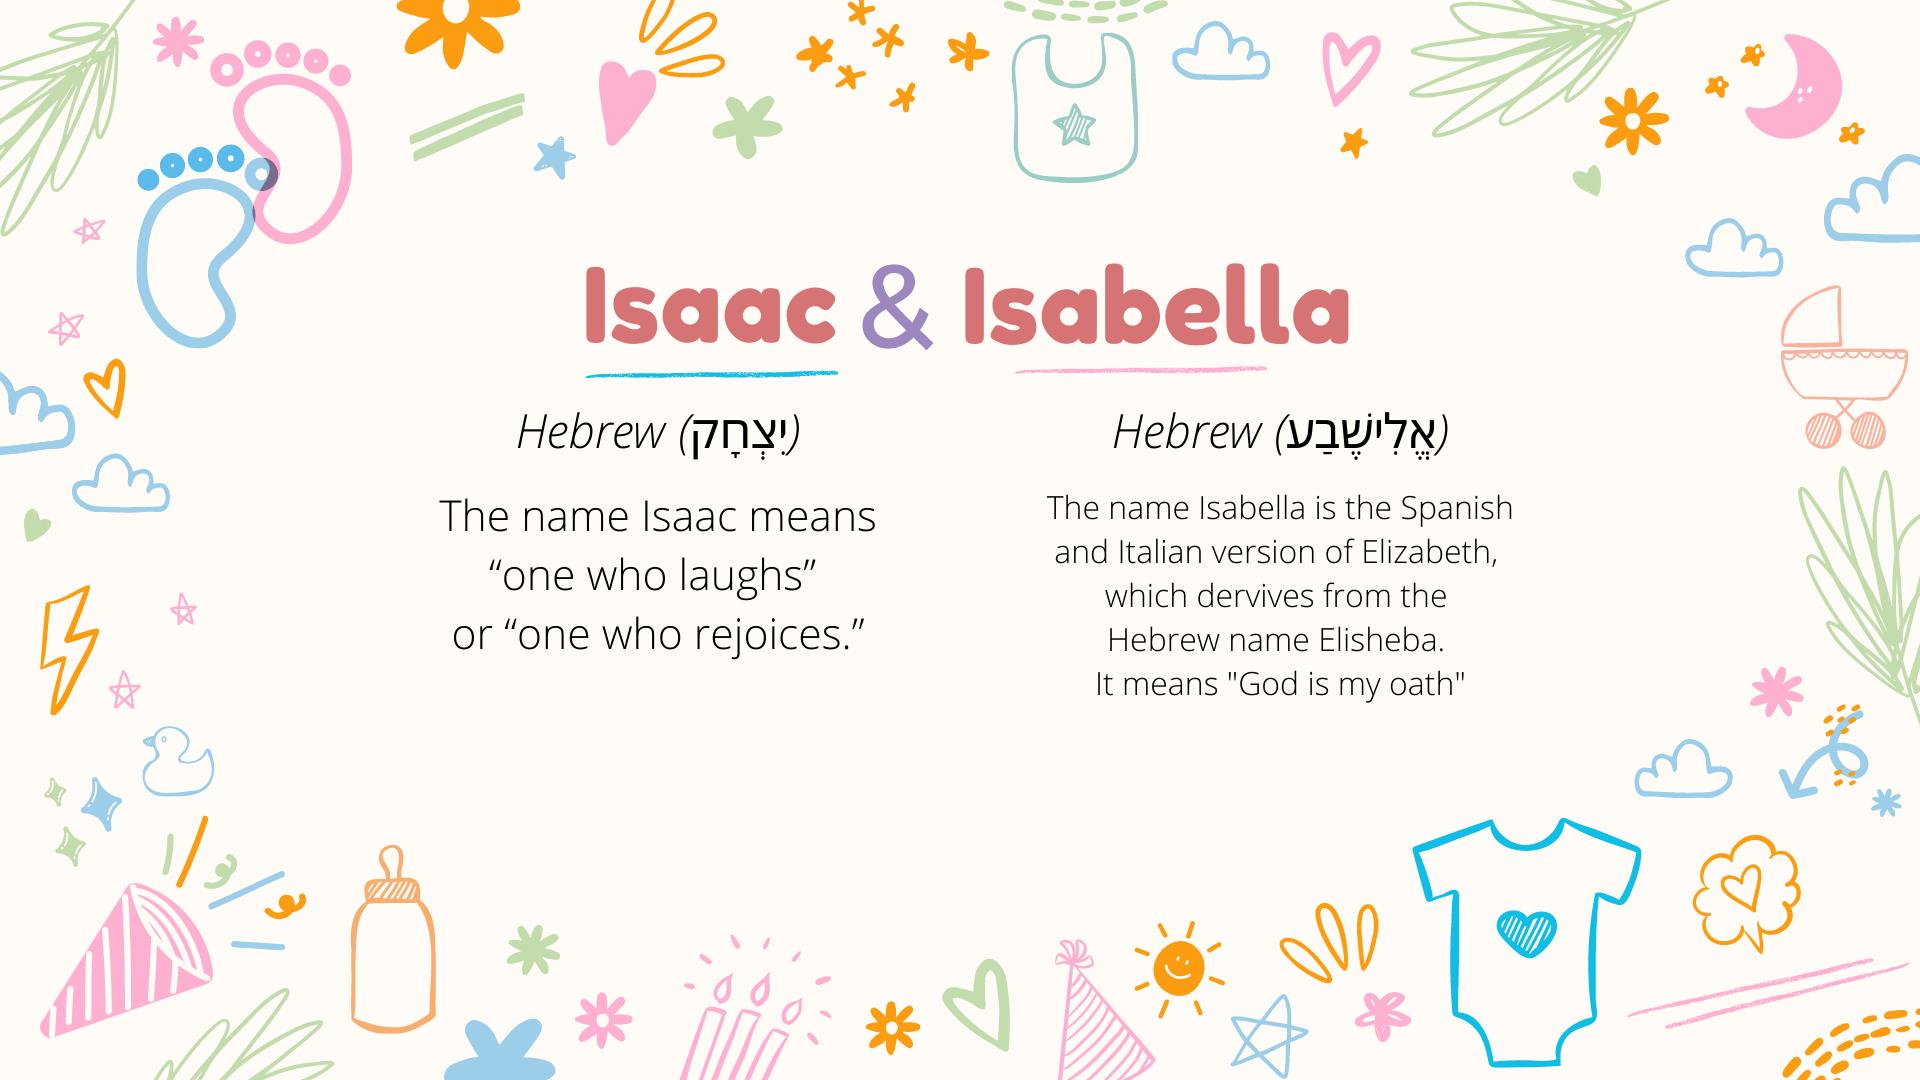 Signification des noms Isaac et Isabella